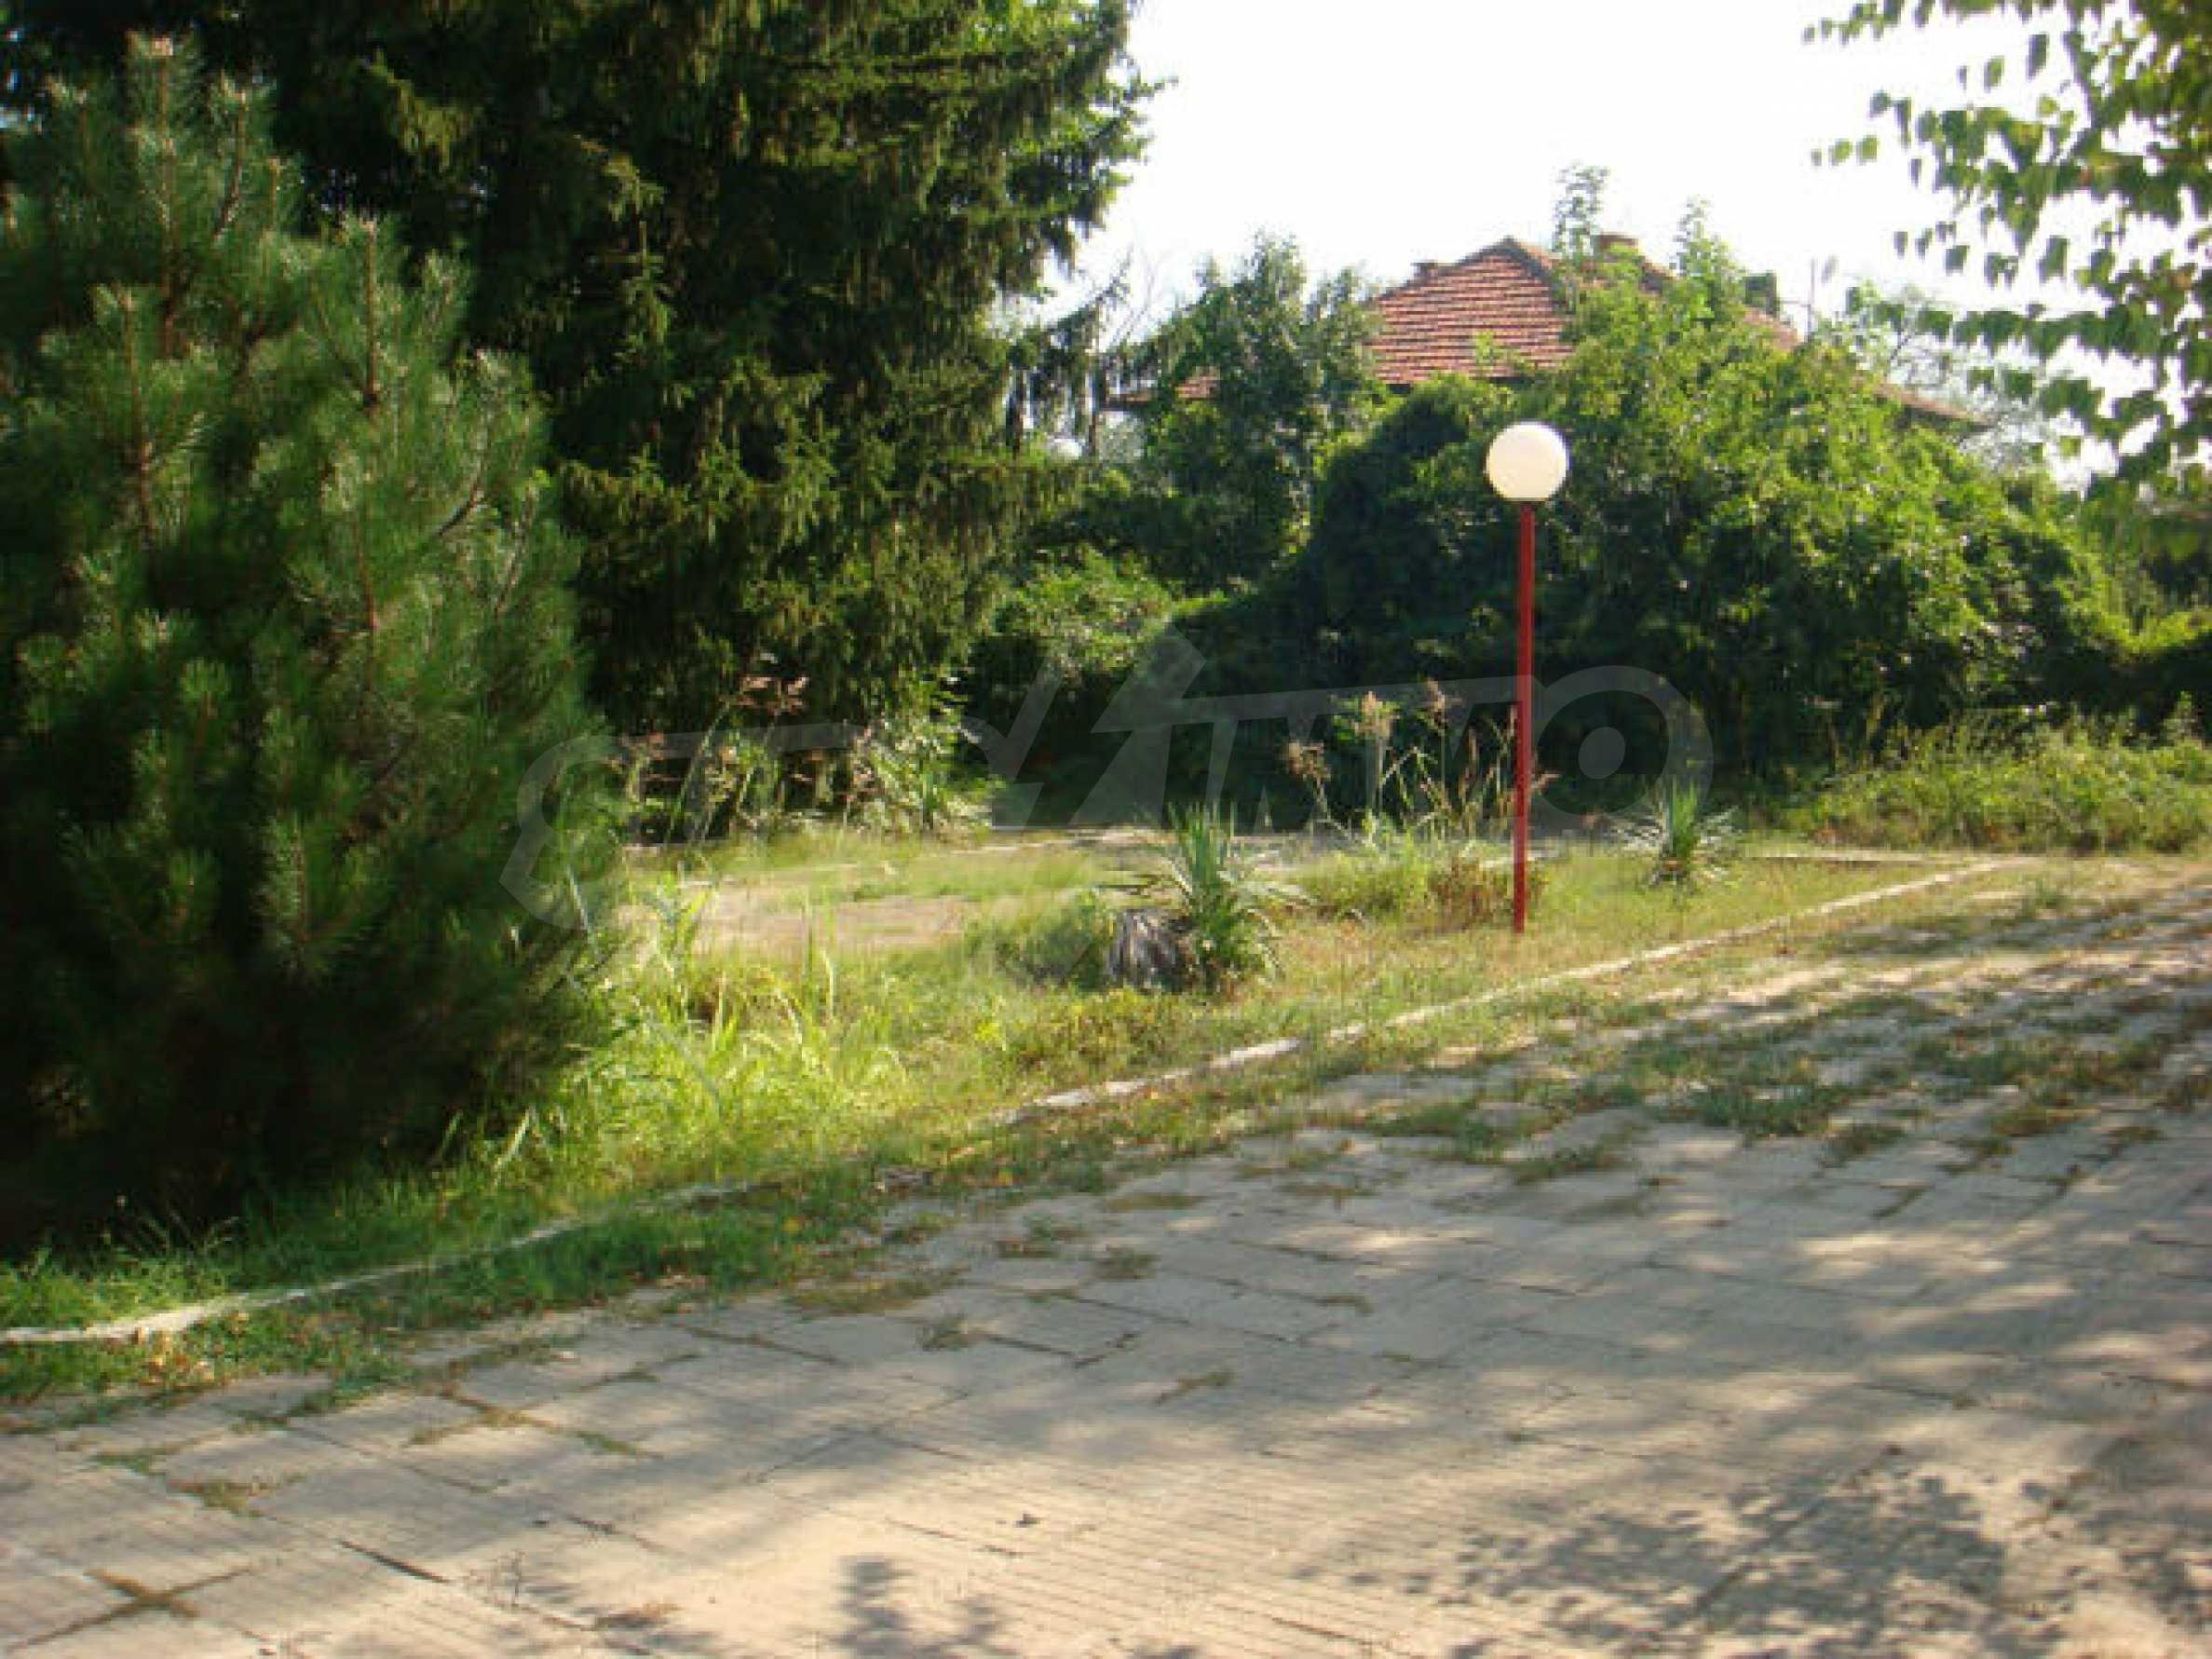 House for sale in village near Vidin 19